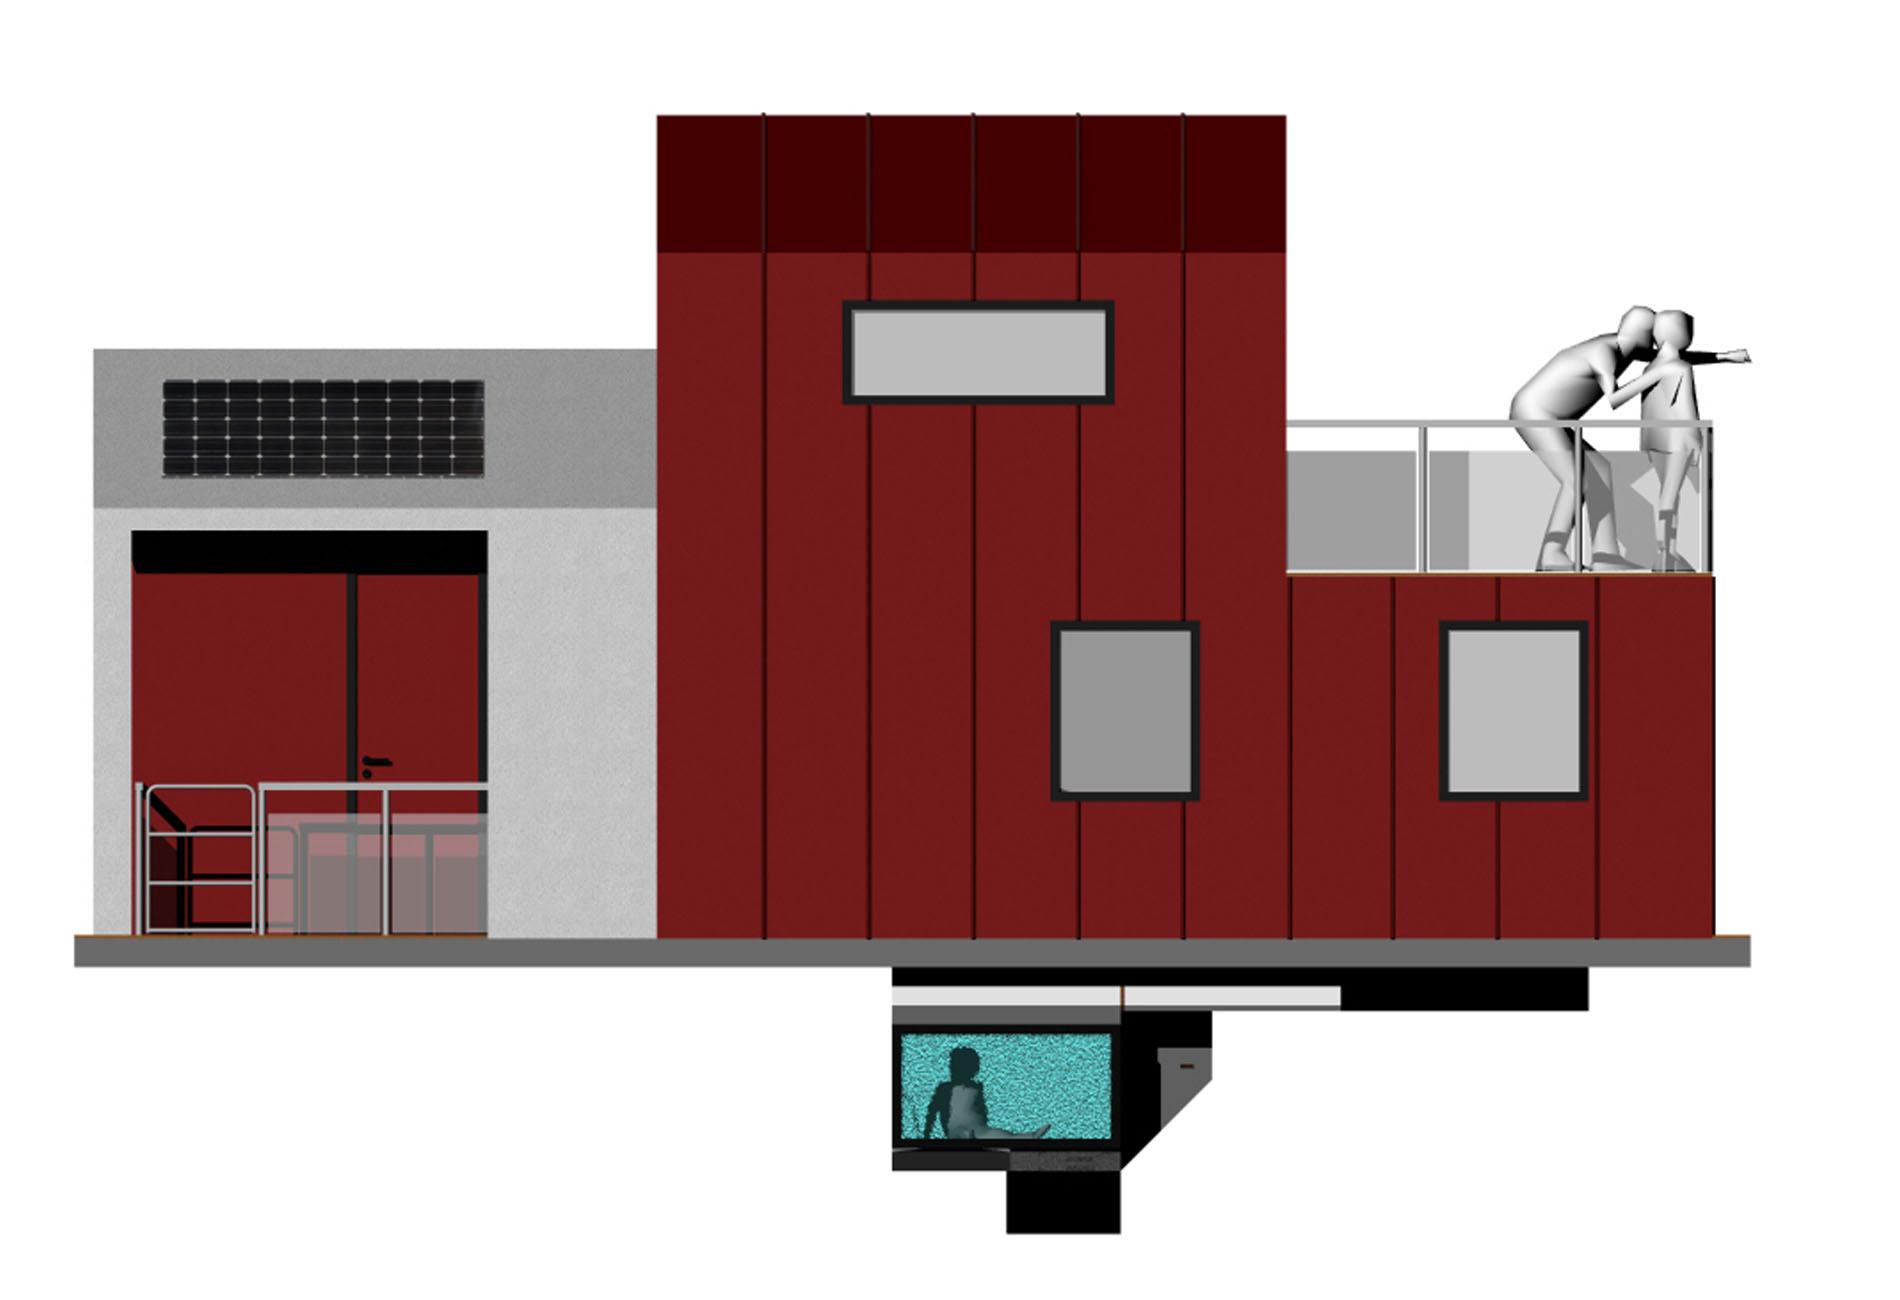 Junhome-maison-flottante-Architecture-navale-Vincent-Lebailly-Boat-design-profile